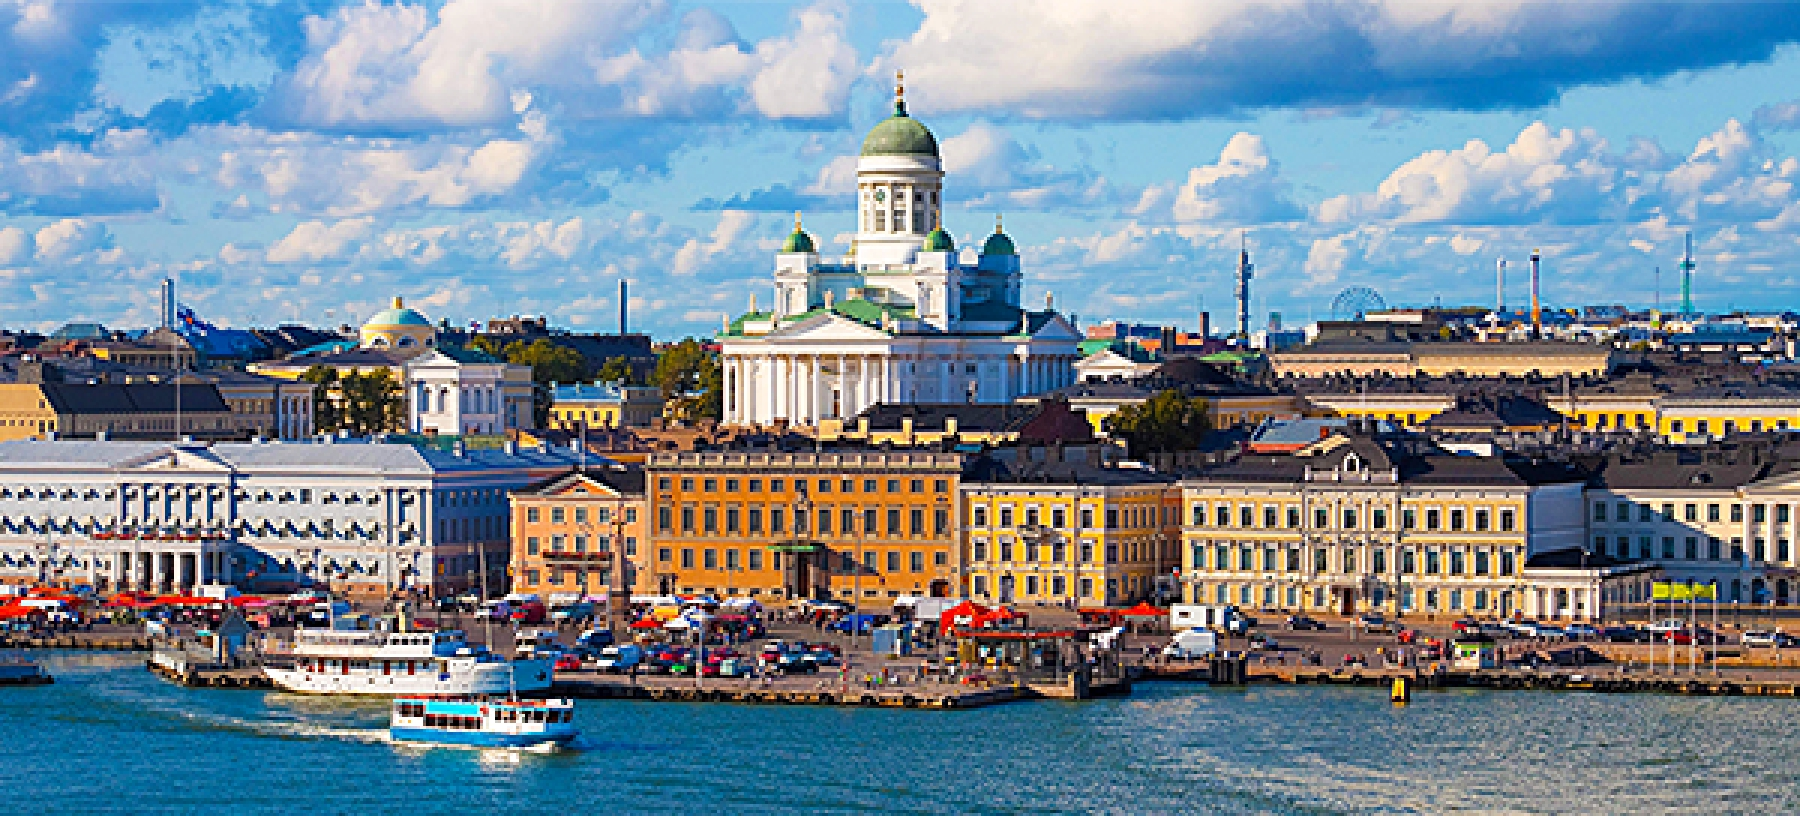 6denní Pobaltí – Vilnius, Riga, Tallin a Helsinky